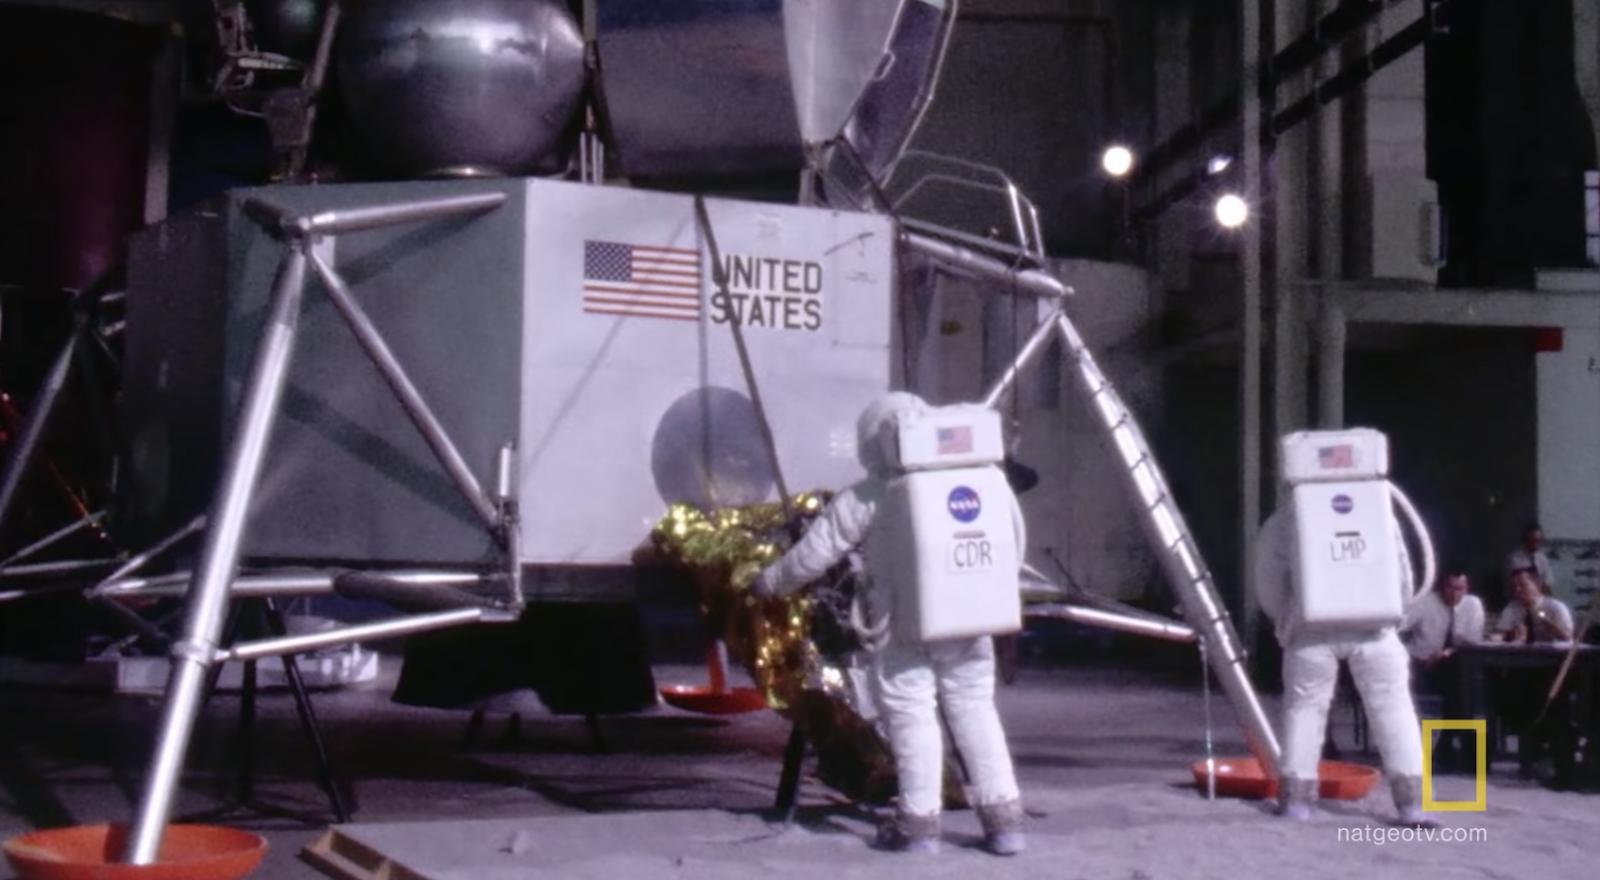 apollo space program documentary - photo #11